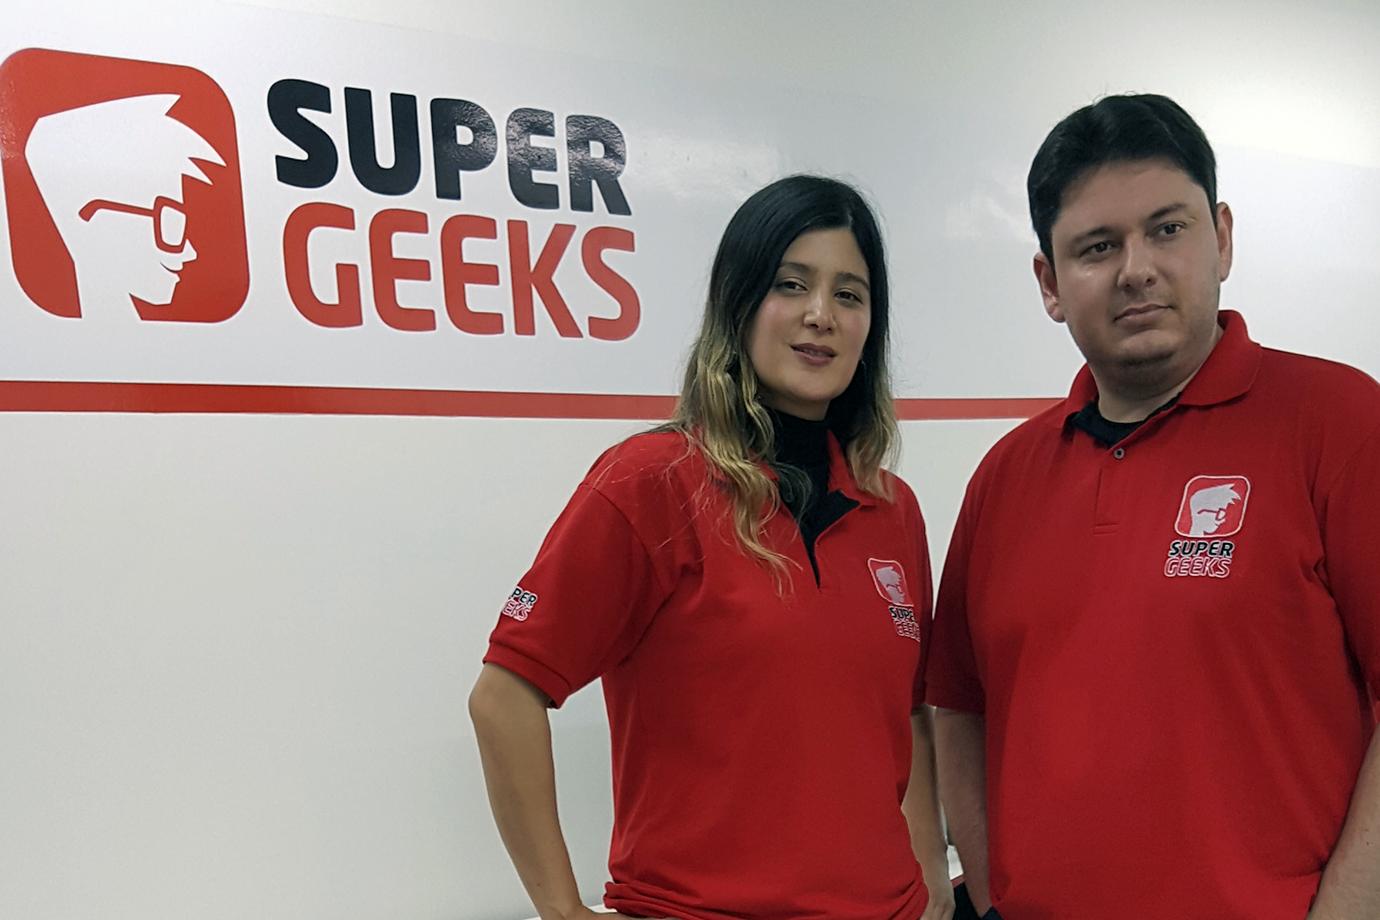 Marco Giroto e Vanessa Ban, da SuperGeeks